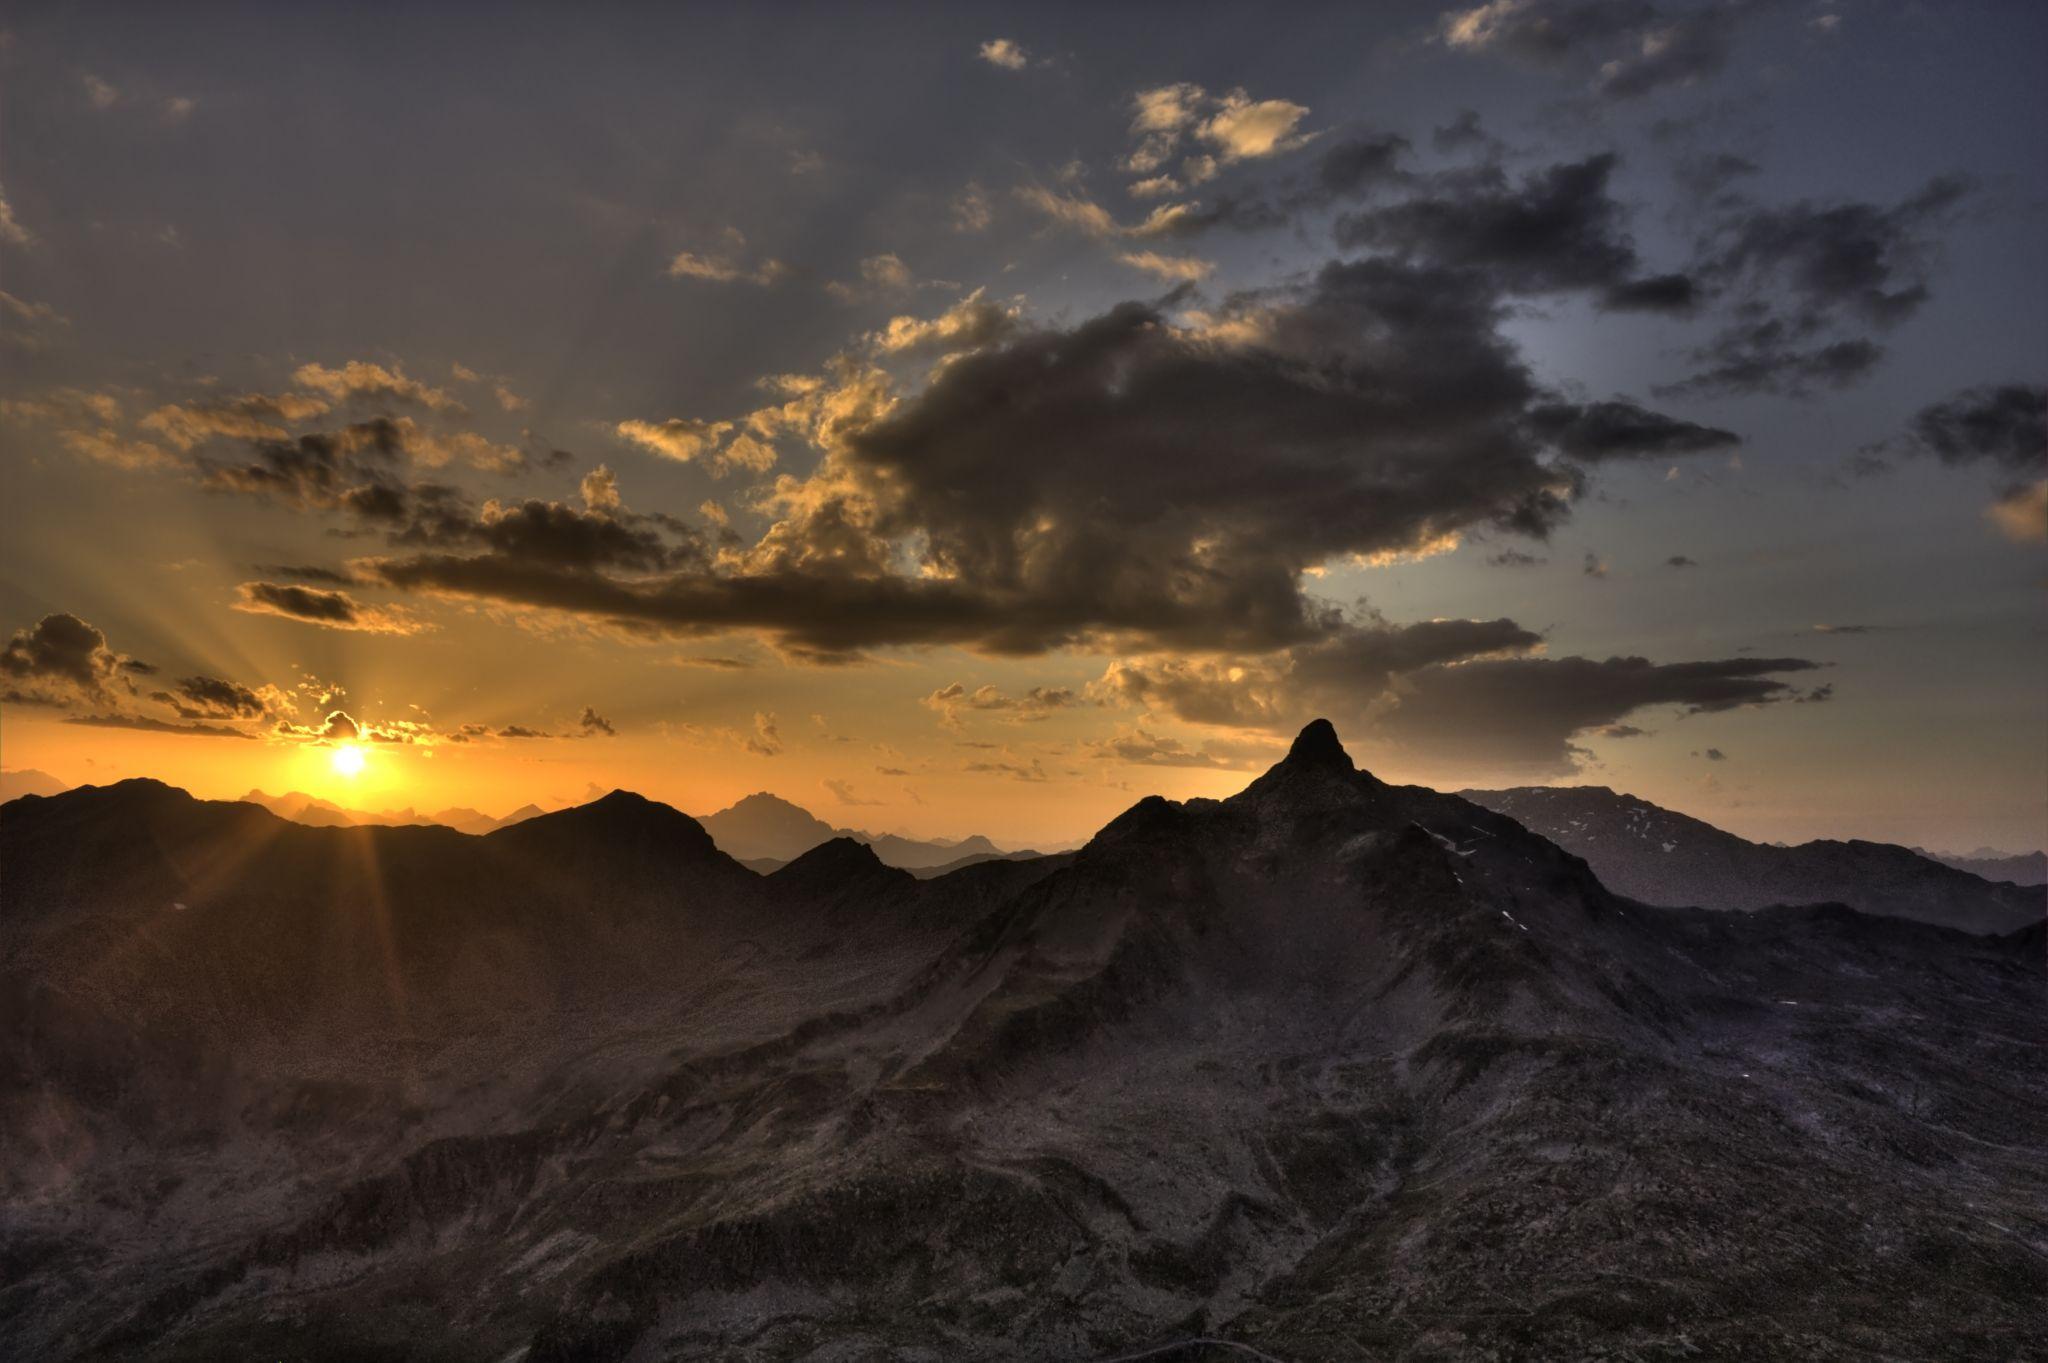 Landscape from mount Gaviola, Italy